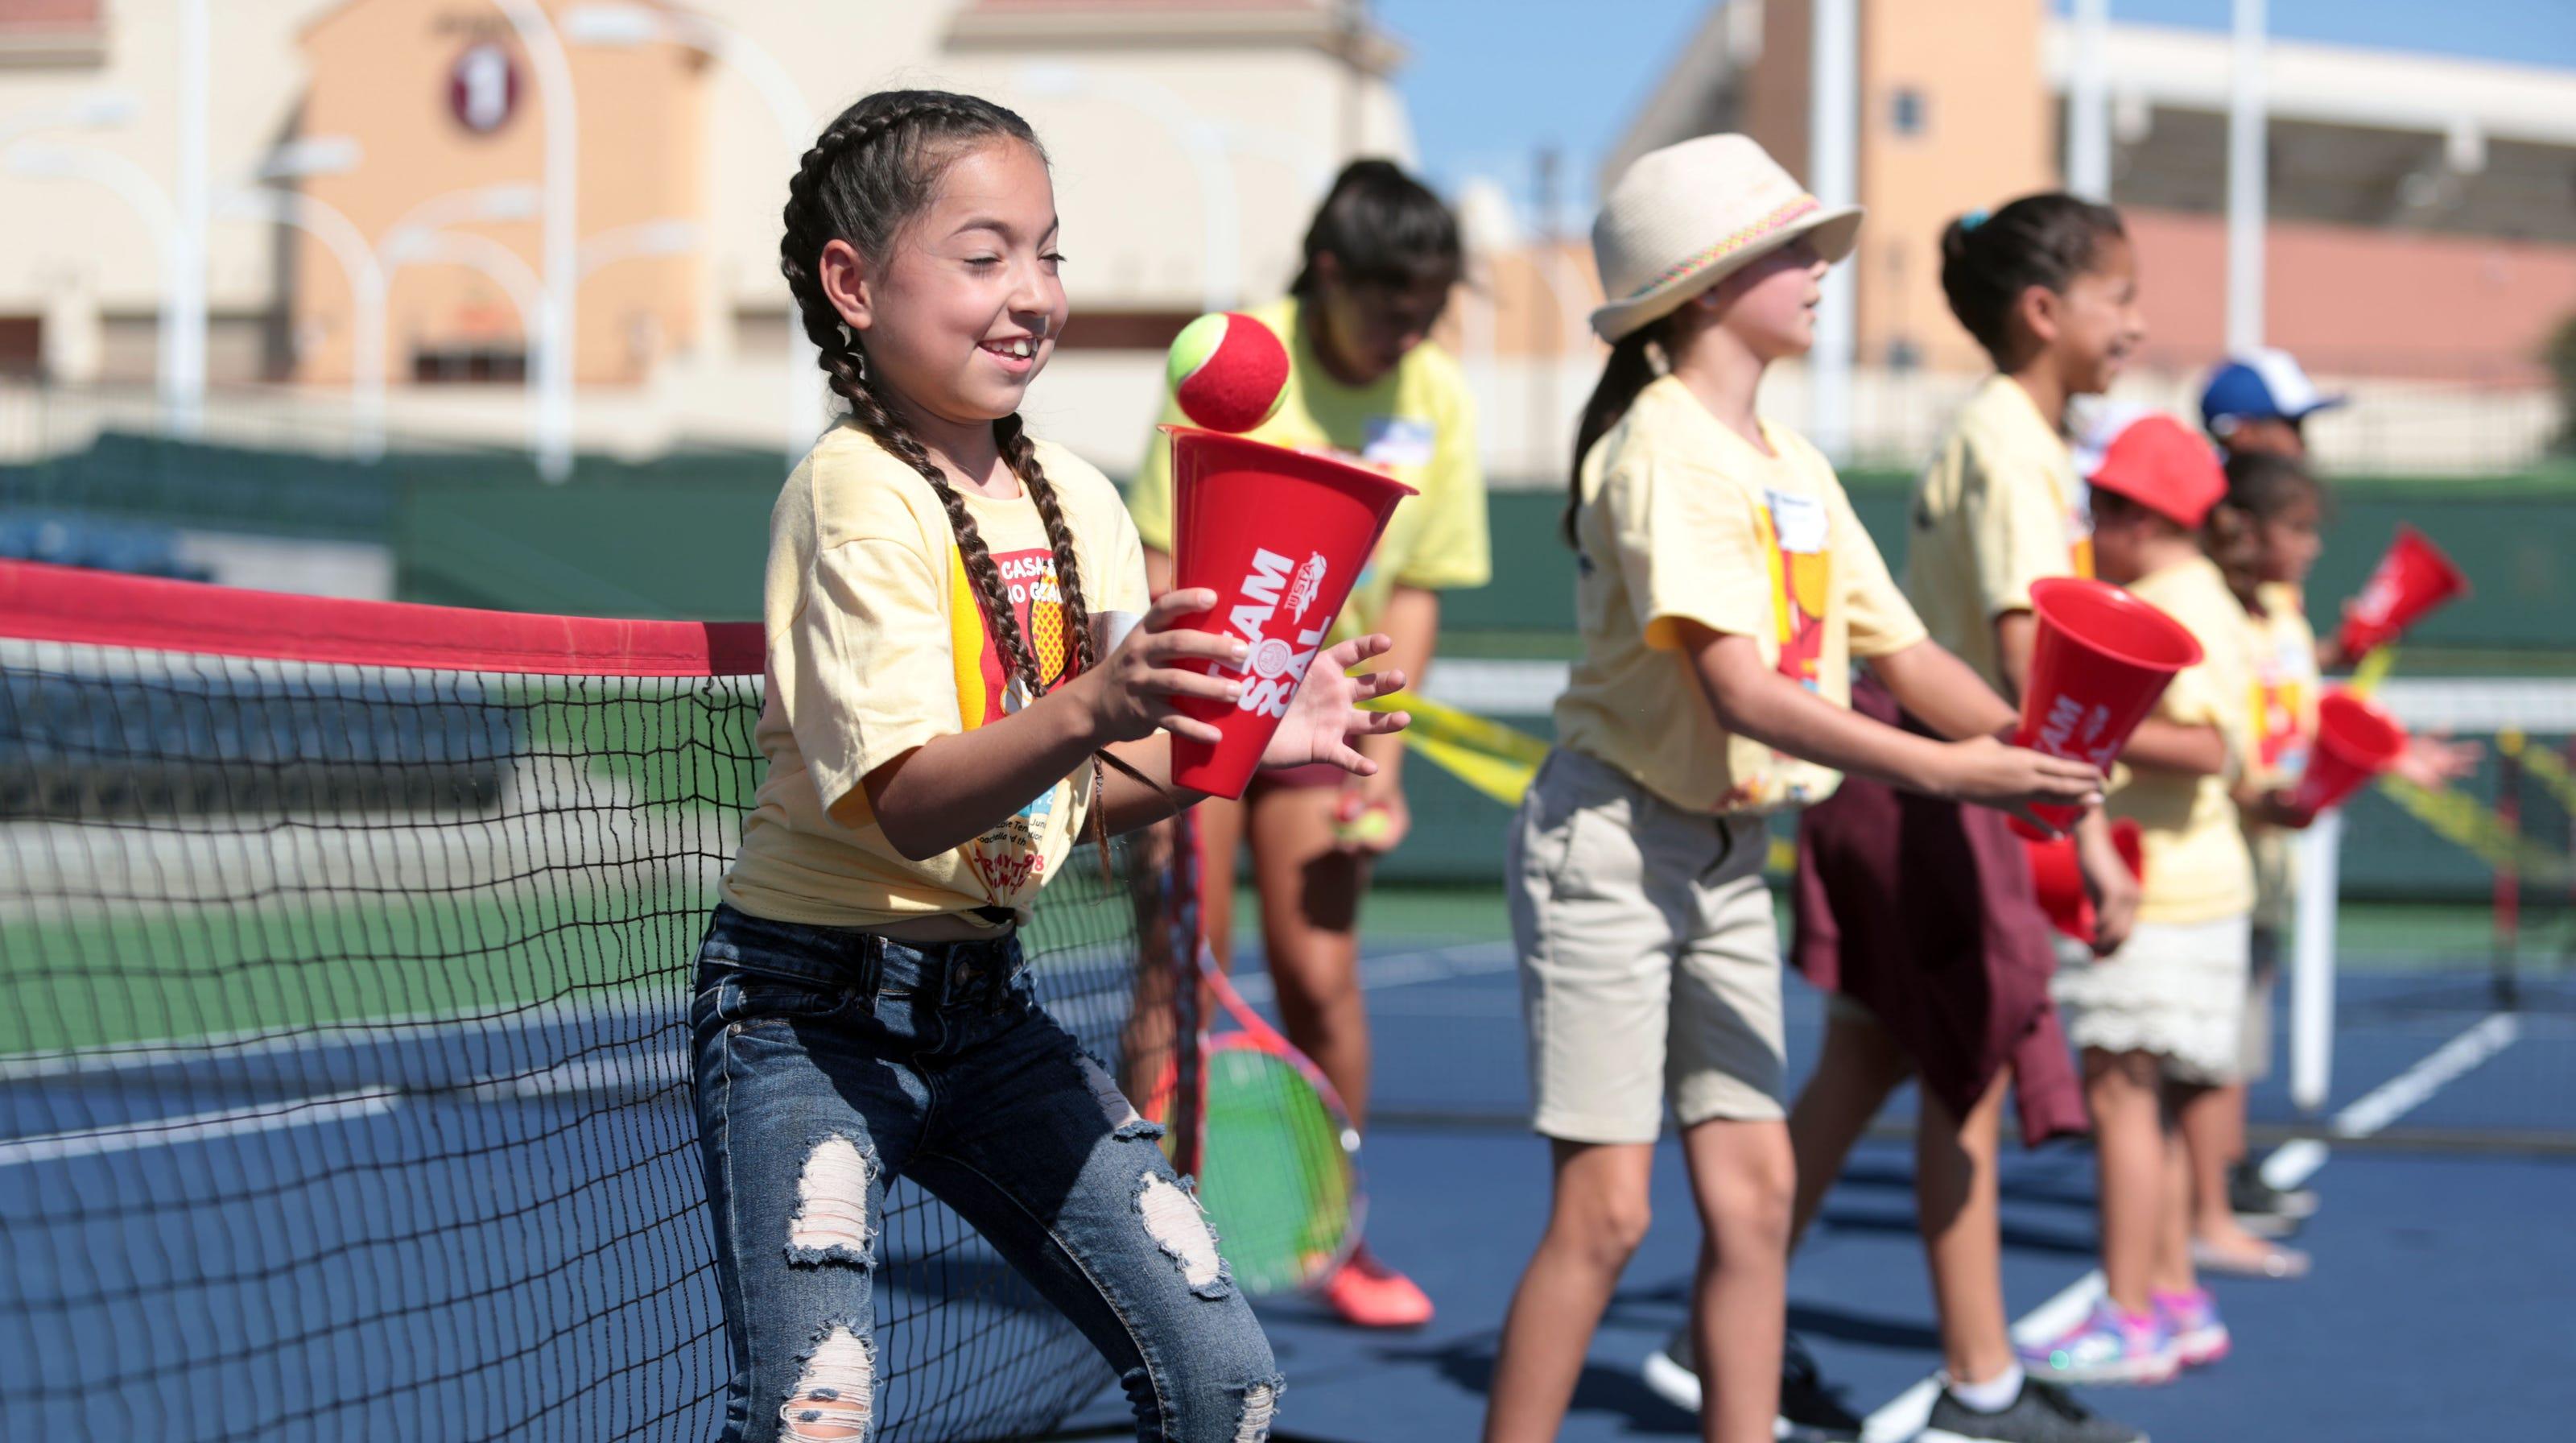 769a6e5f 7b09 4474 9a72 8107695293d8 Rosie Casals Tennis Camp006 JPG?crop=5471,3063,x0,y0&width=3200&height=1792&format=pjpg&auto=webp.'